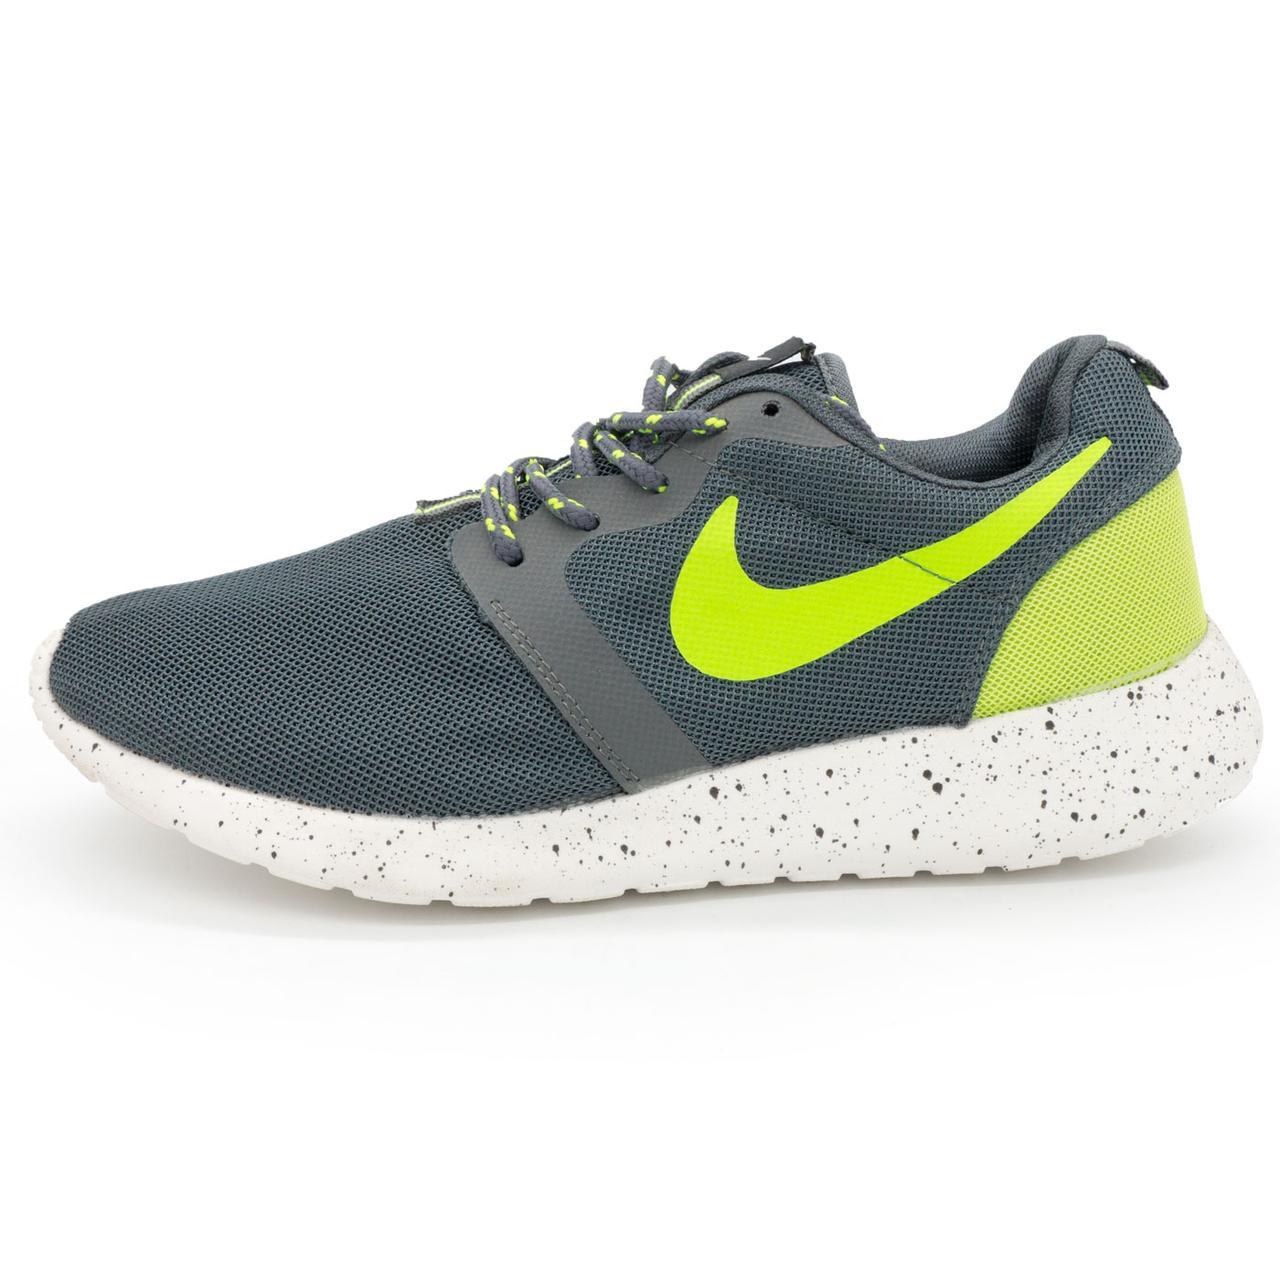 37520e87ff05f0 Nike Roshe Run 2 серые в крапенку р.(40), цена 350 грн., купить в ...